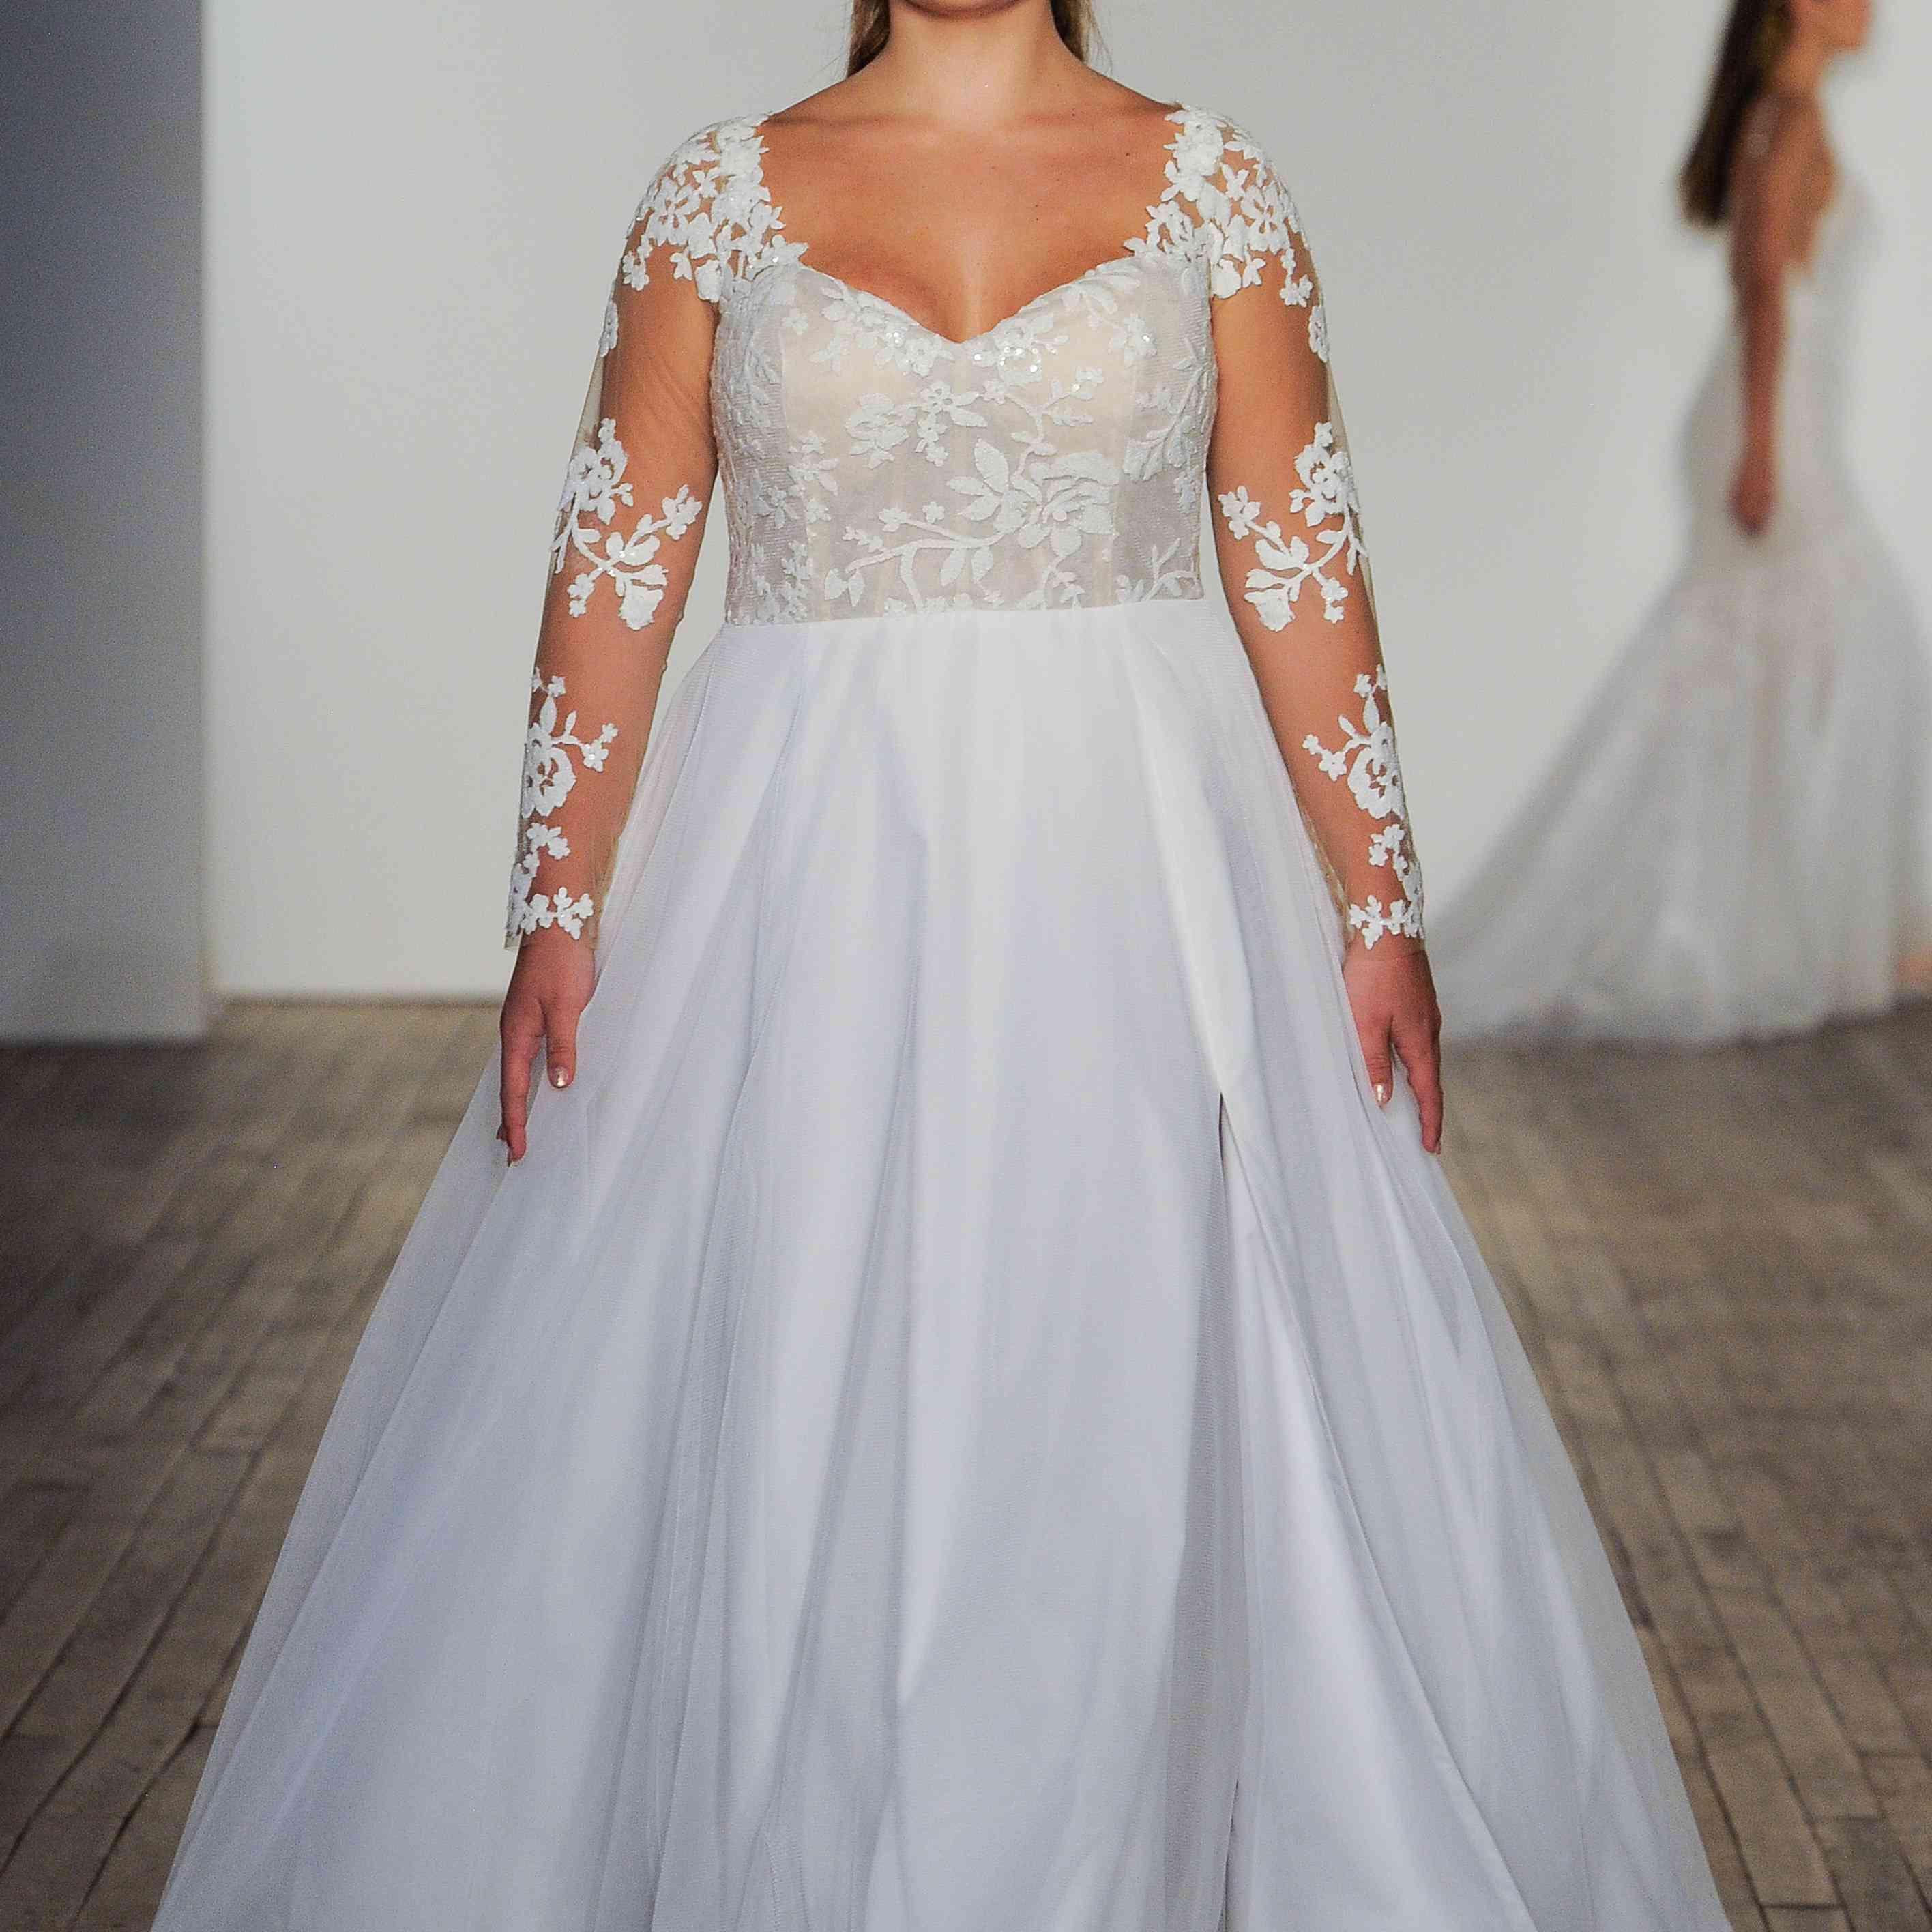 Remi Blush by Hayley Paige Wedding Dress